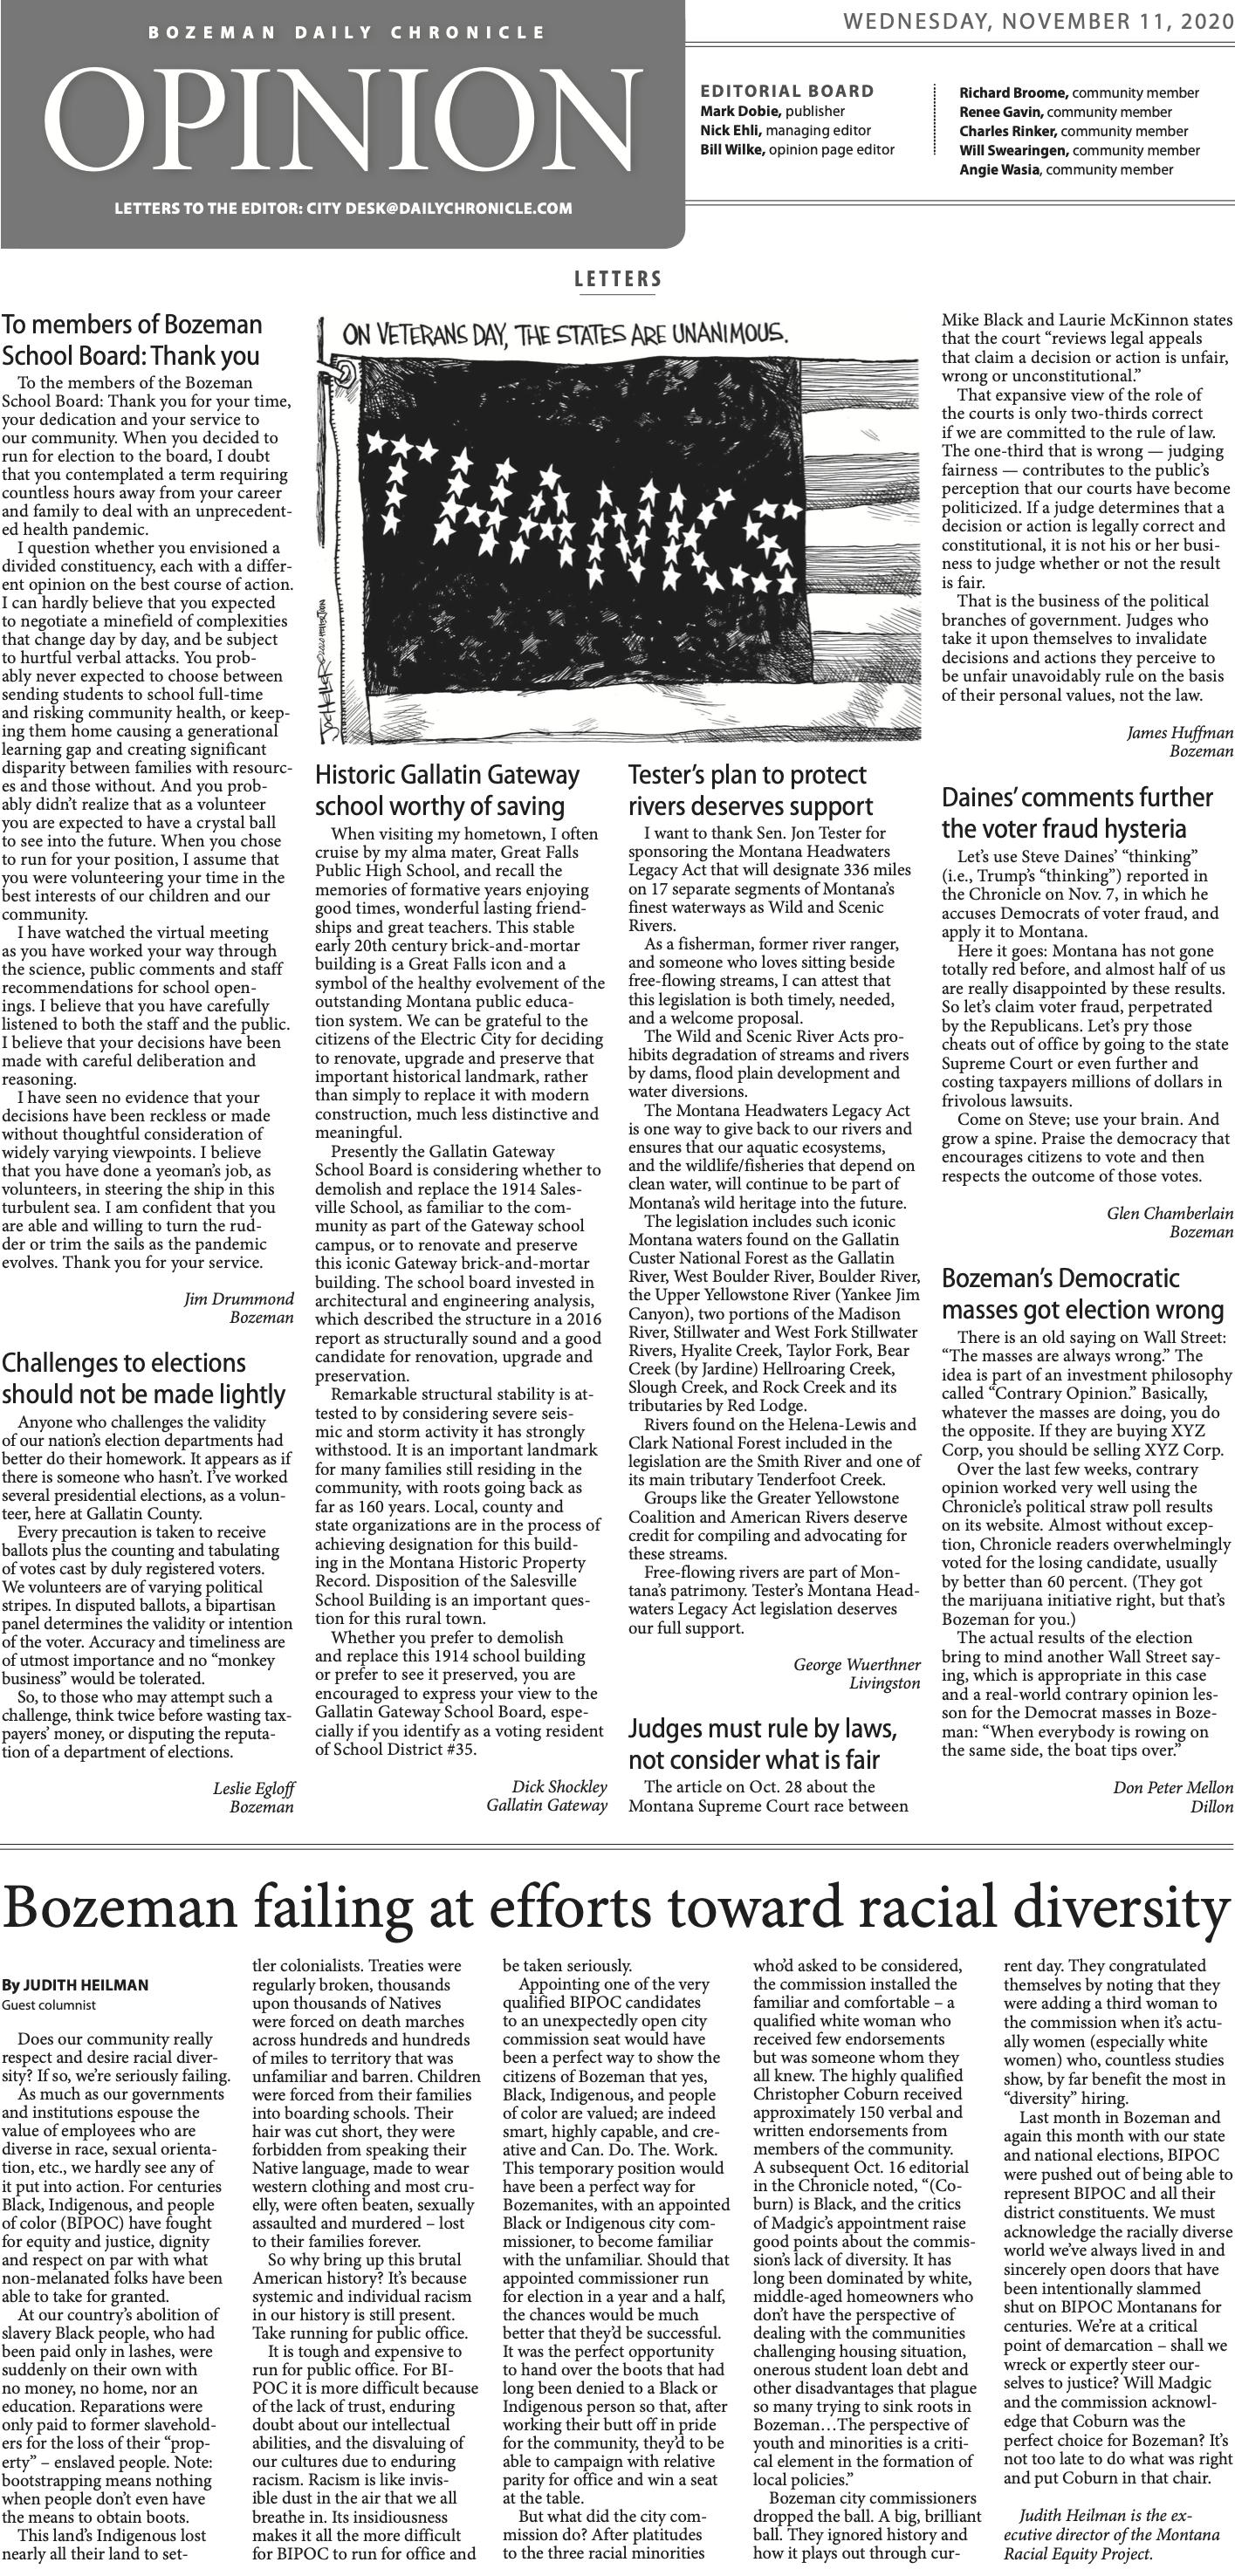 Bozeman failing at efforts toward racial diversity